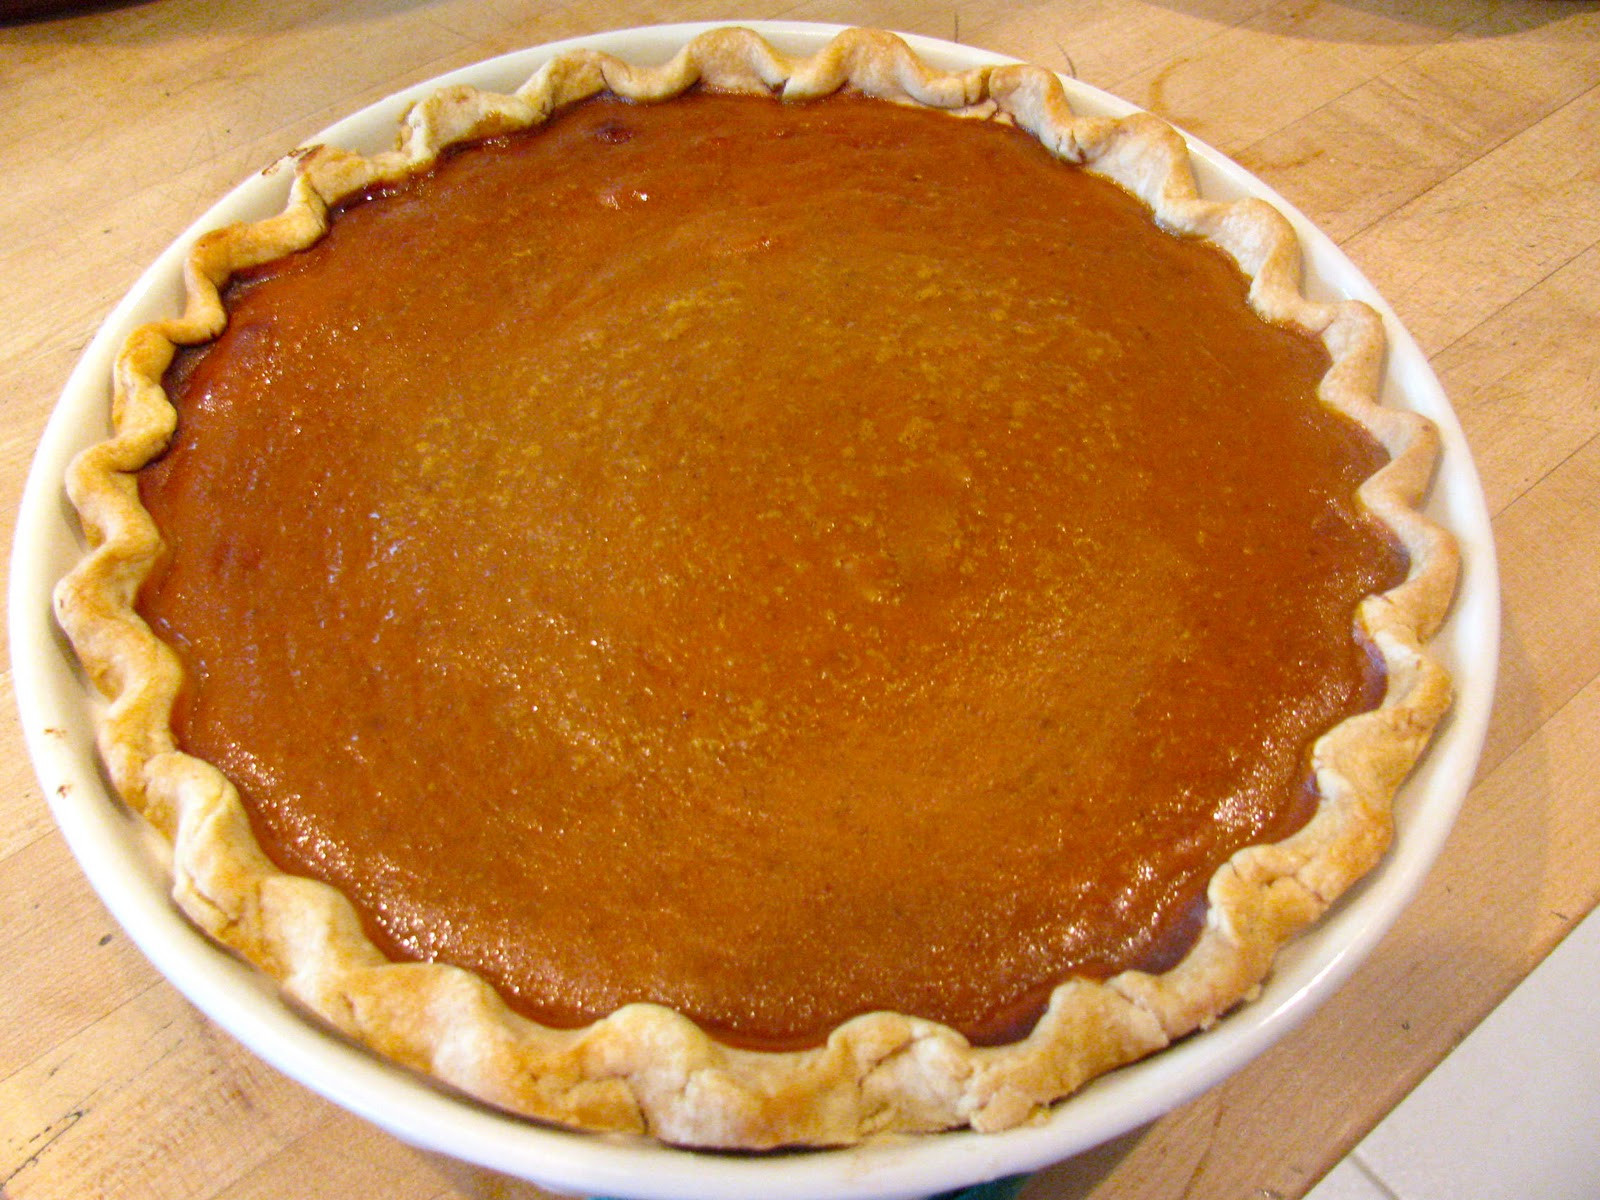 How To Store Pumpkin Pie  whole pumpkin pie The Warren Store The Warren Store